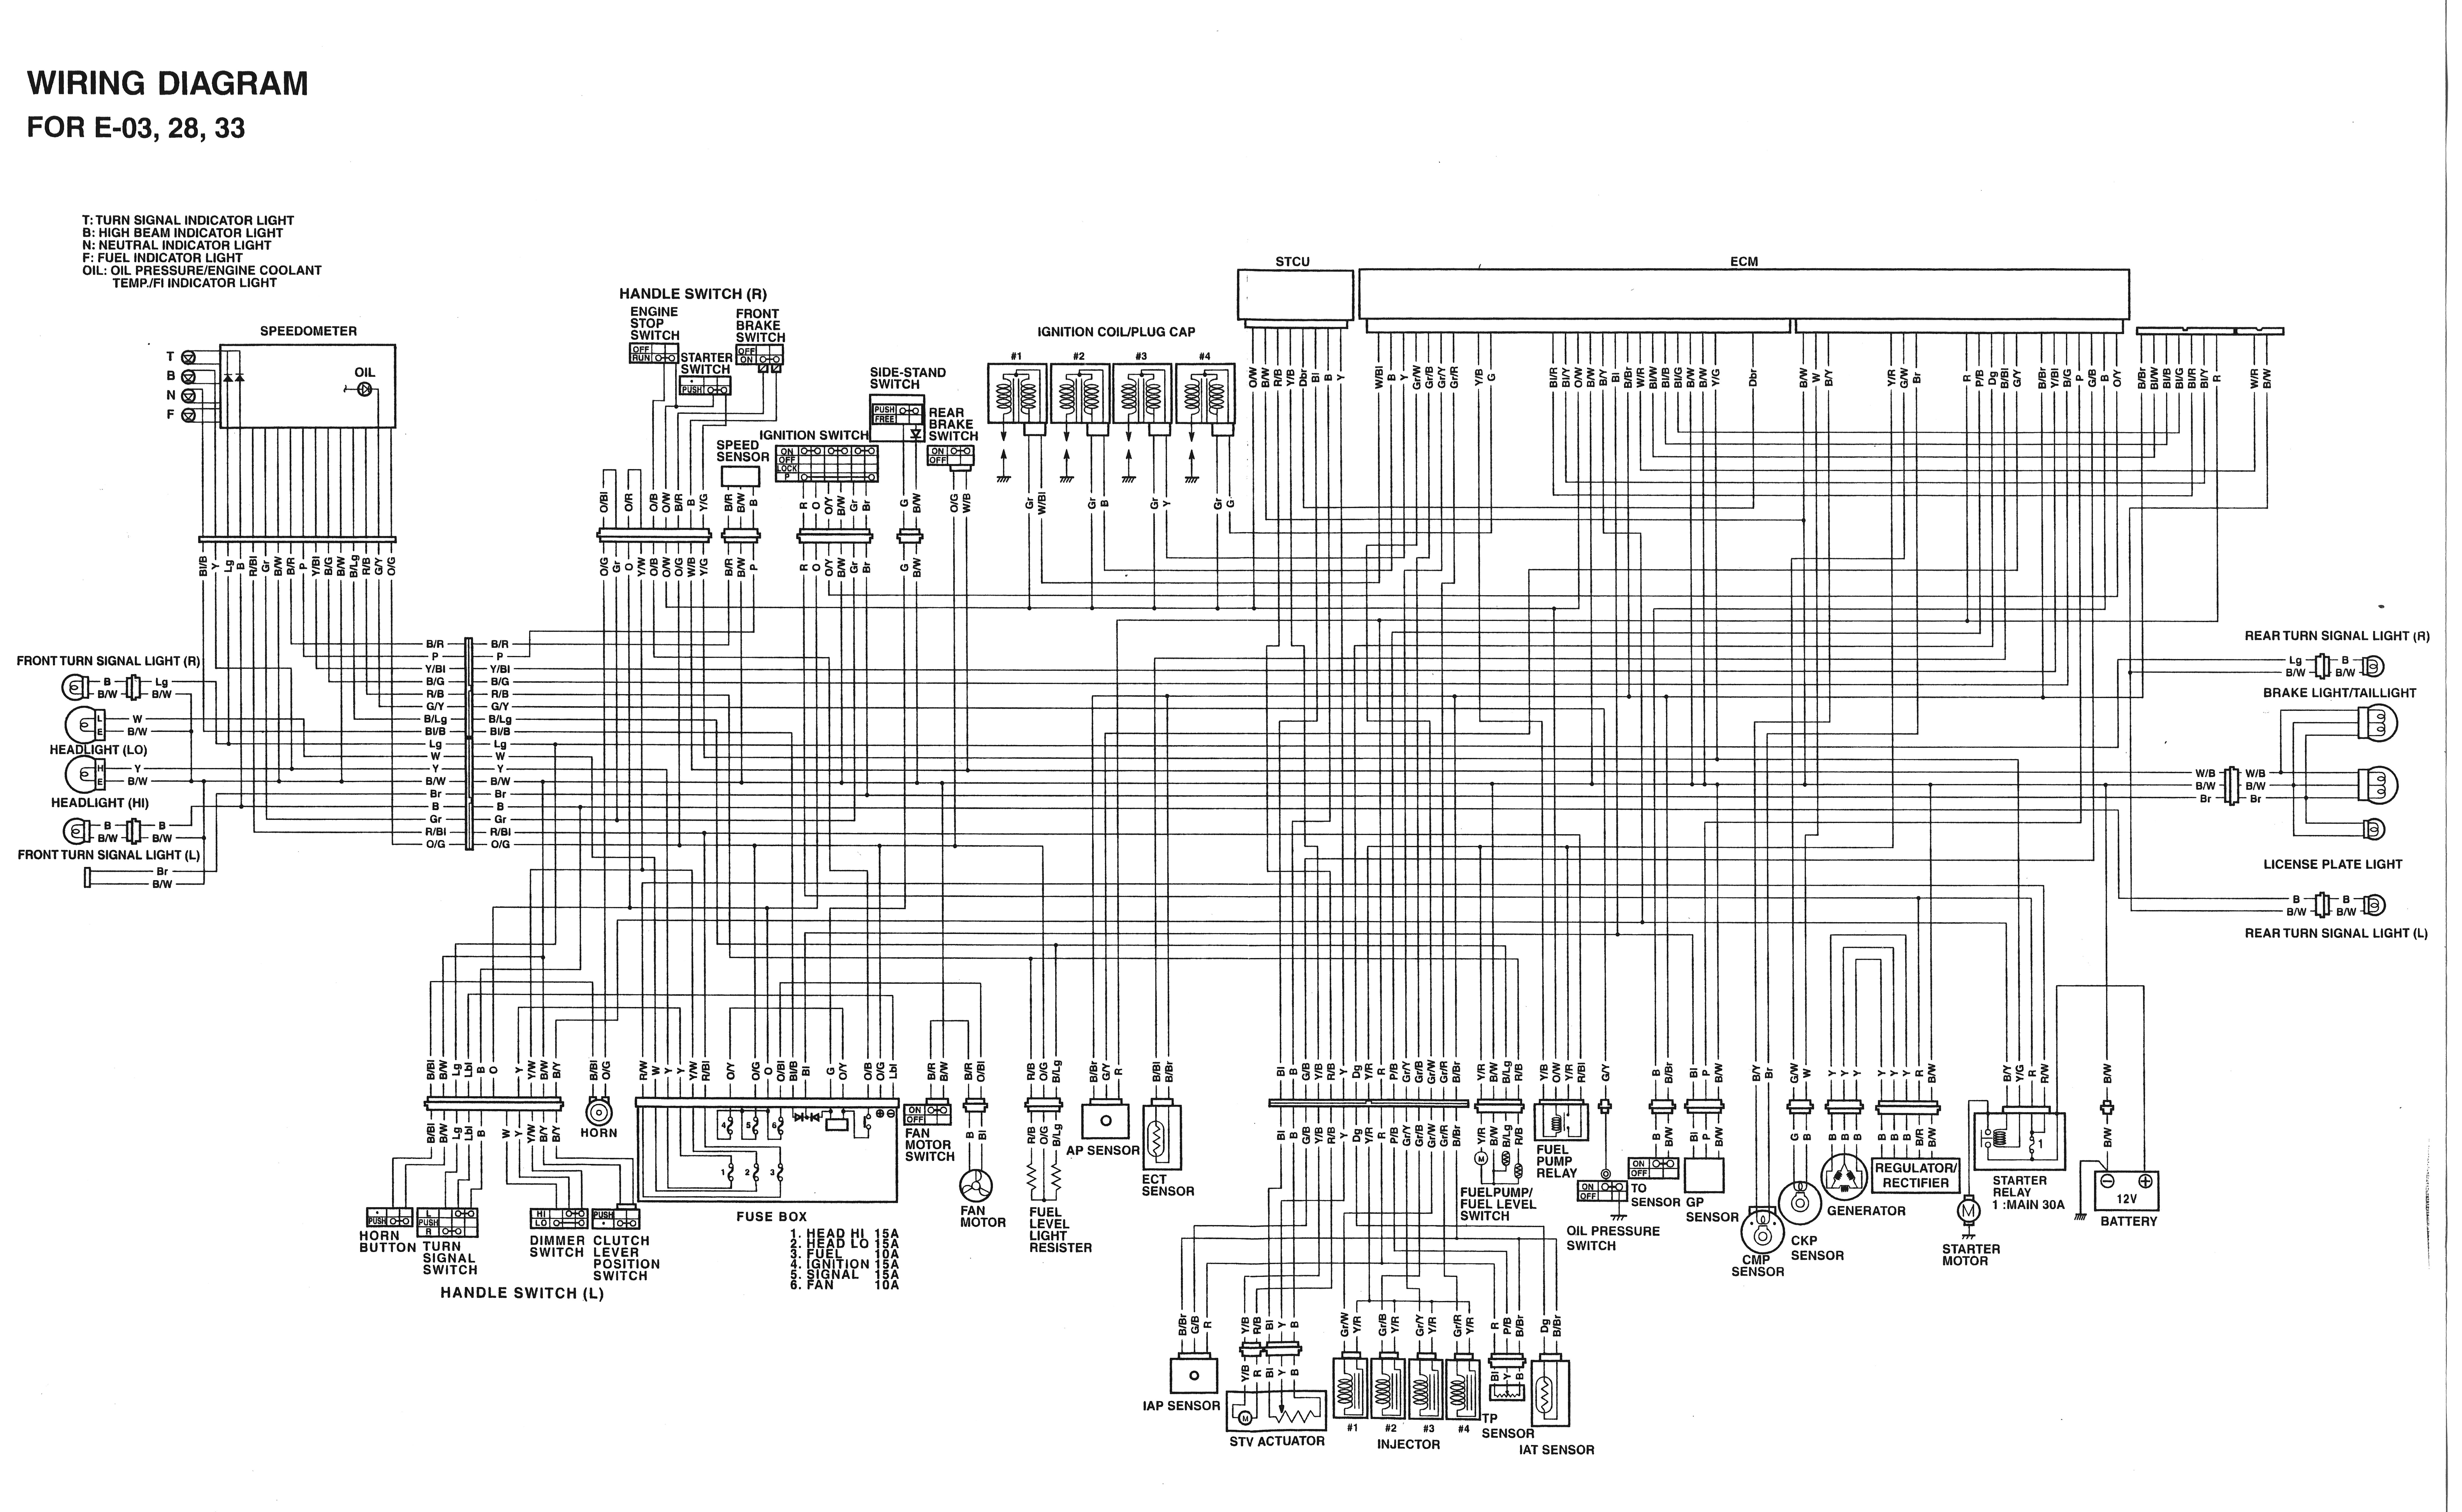 gsxr headlight wiring diagram ta 4471  pin 1993 gsxr 750 wiring diagram suzuki gsx r motorcycle  gsxr 750 wiring diagram suzuki gsx r